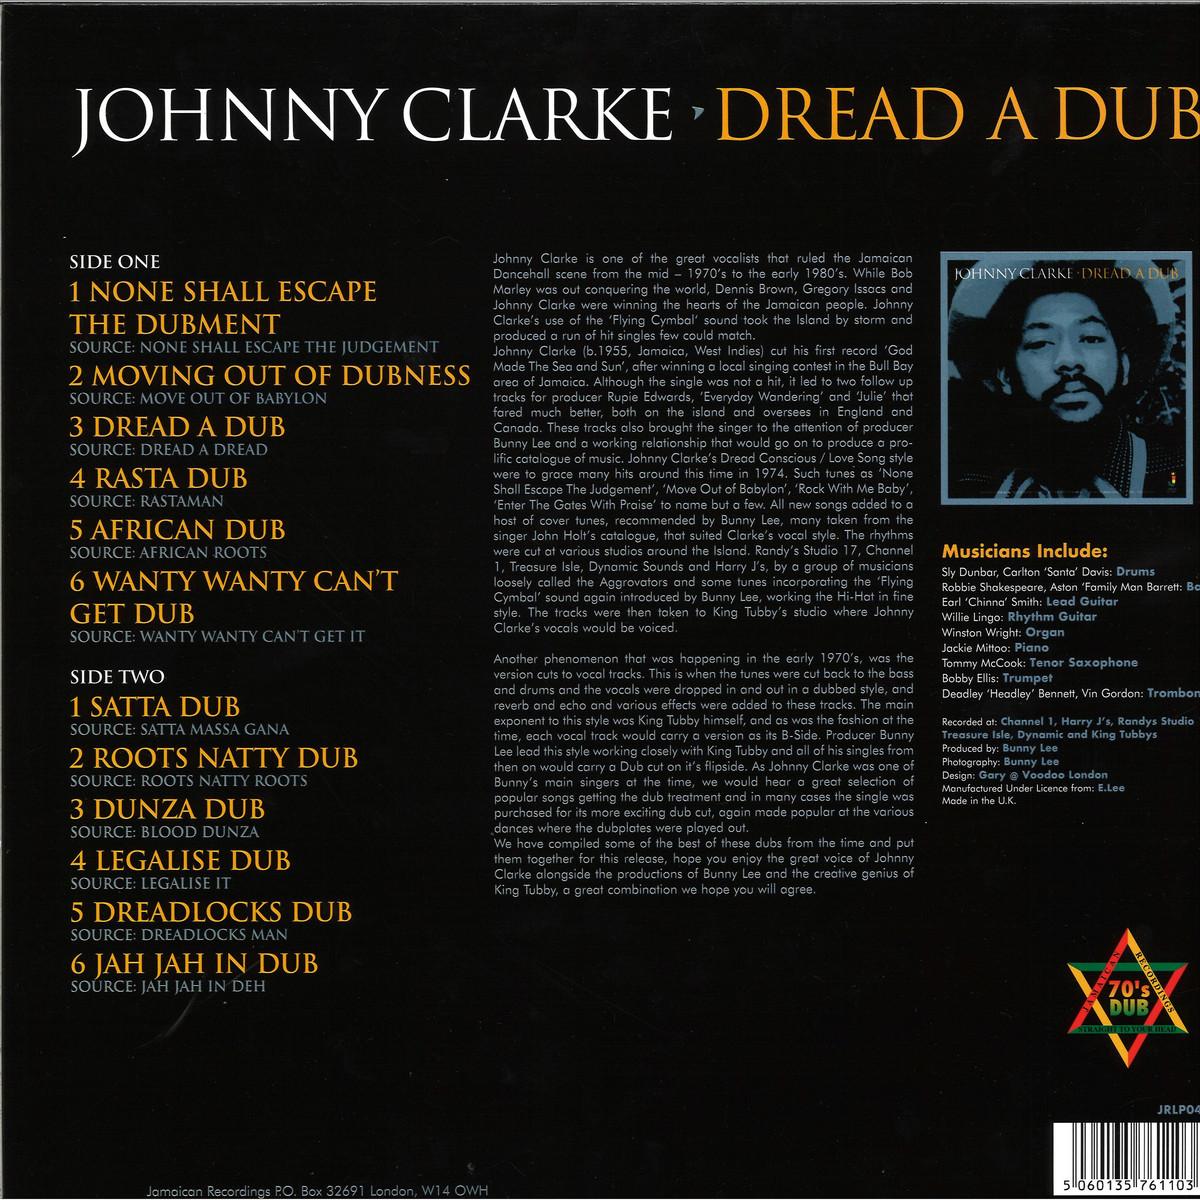 Johnny Clarke - Dread A Dub / Jamaican Recordings LP JRLP048 - Vinyl